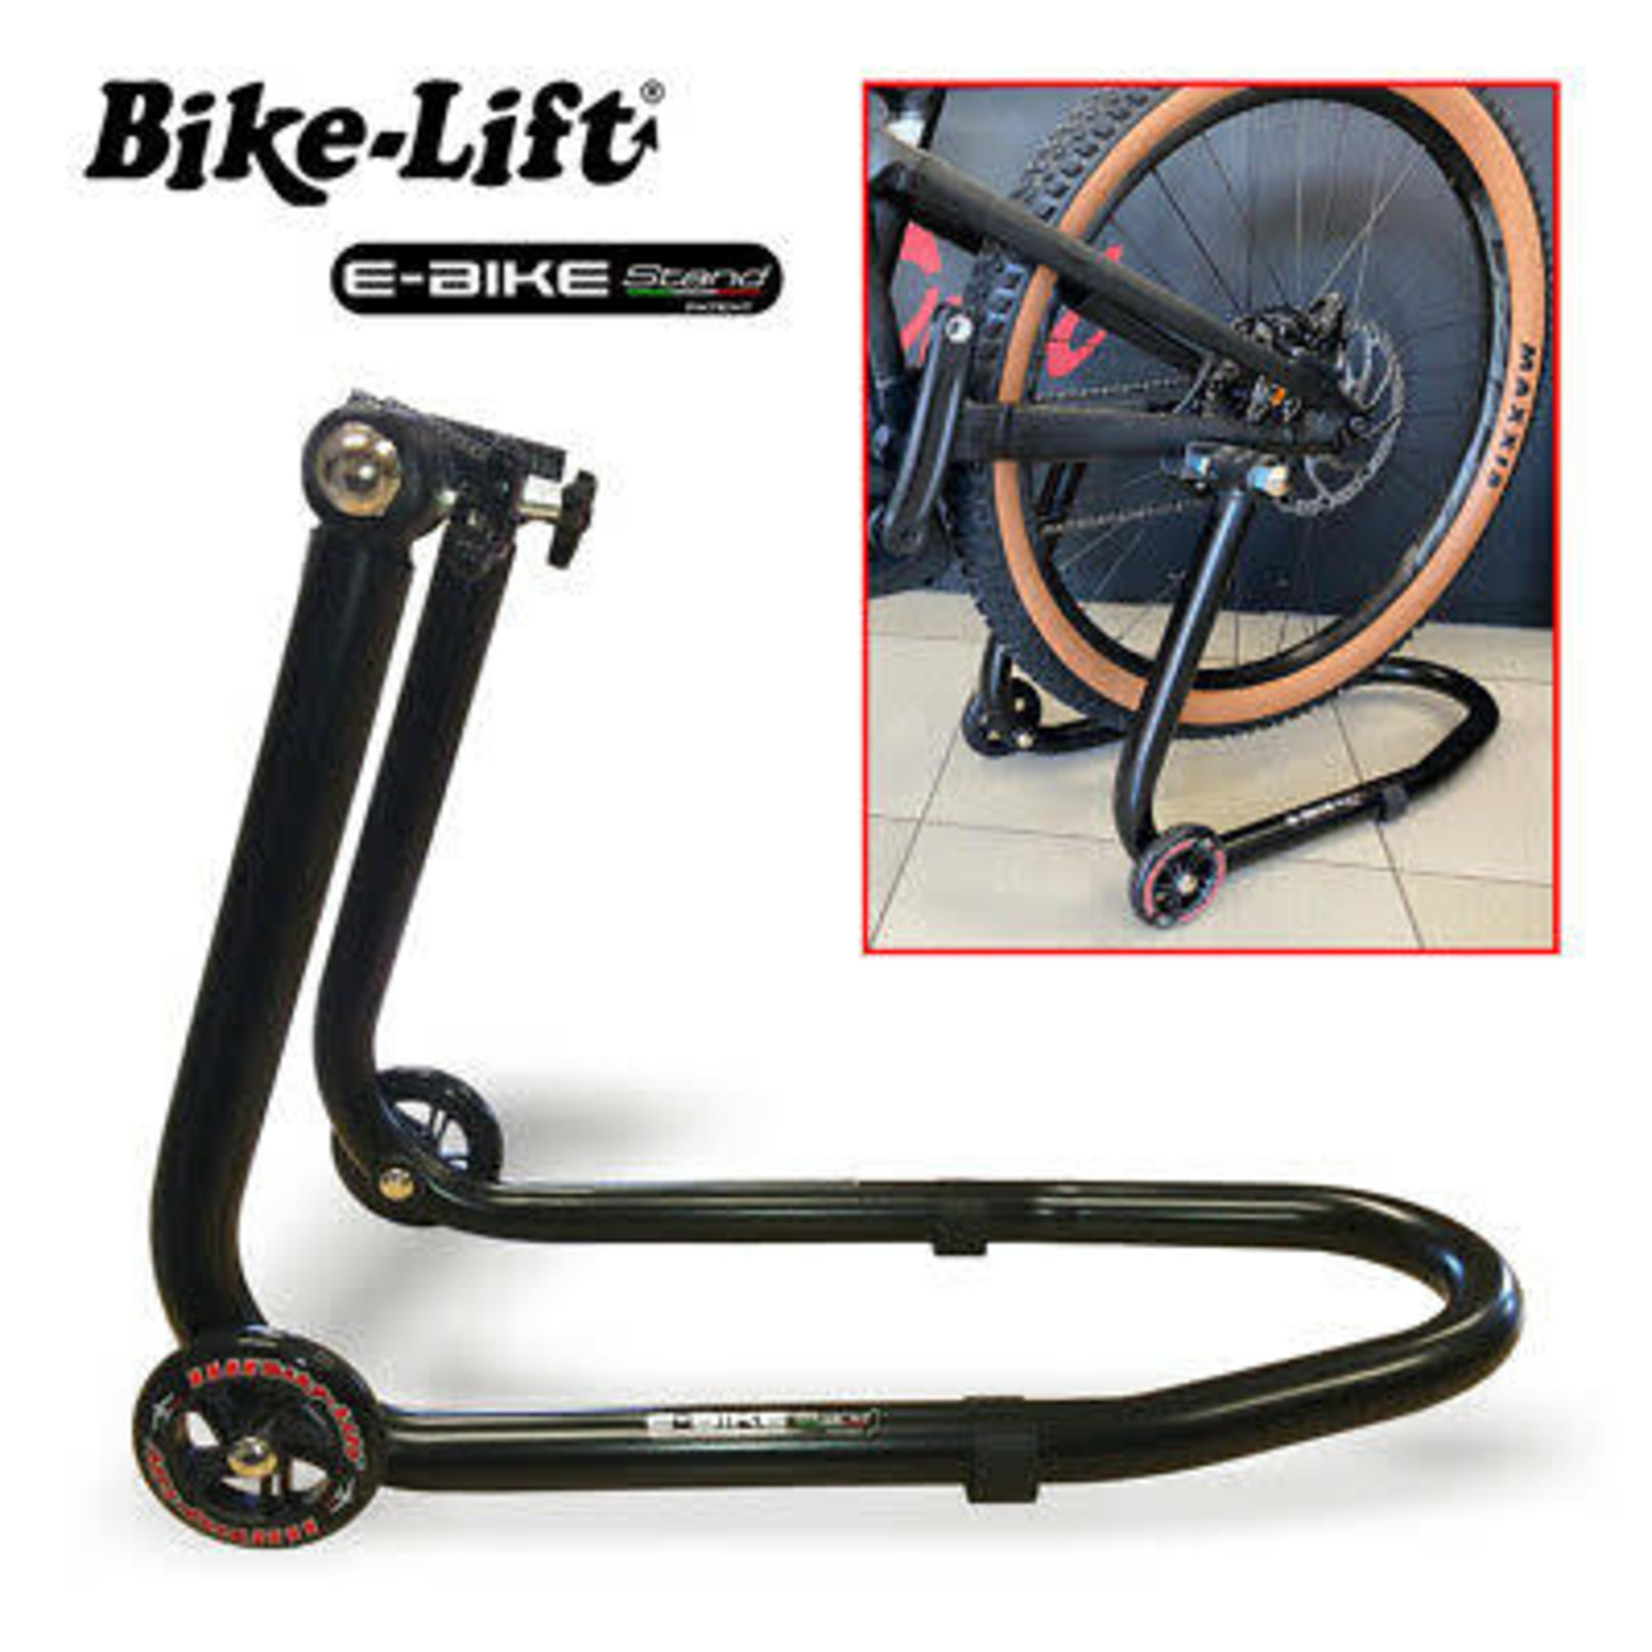 Bike Lift Bike Lift - Fahrradständer Lavoro